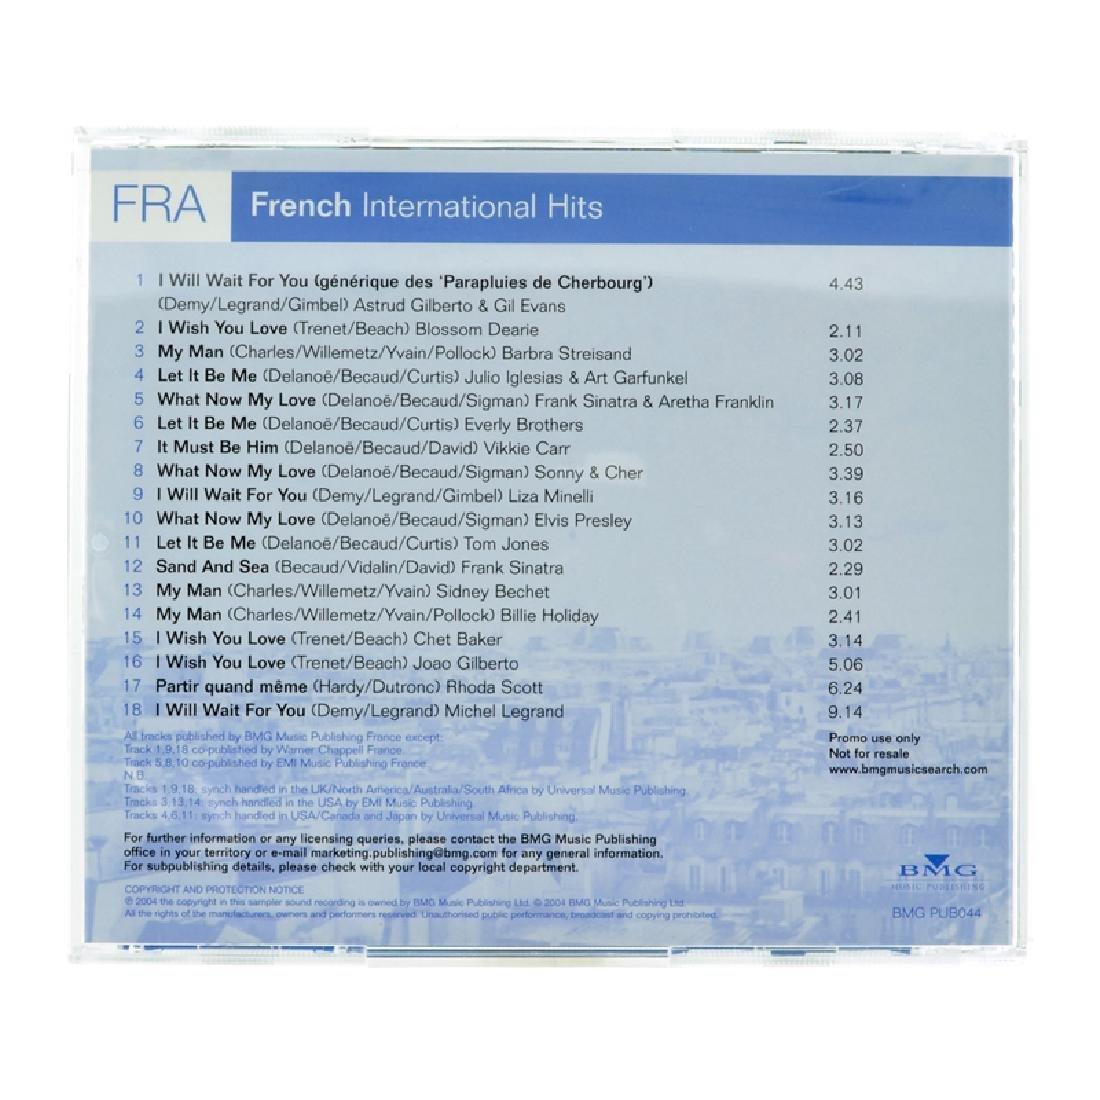 FRA French International Hits CDs - 2